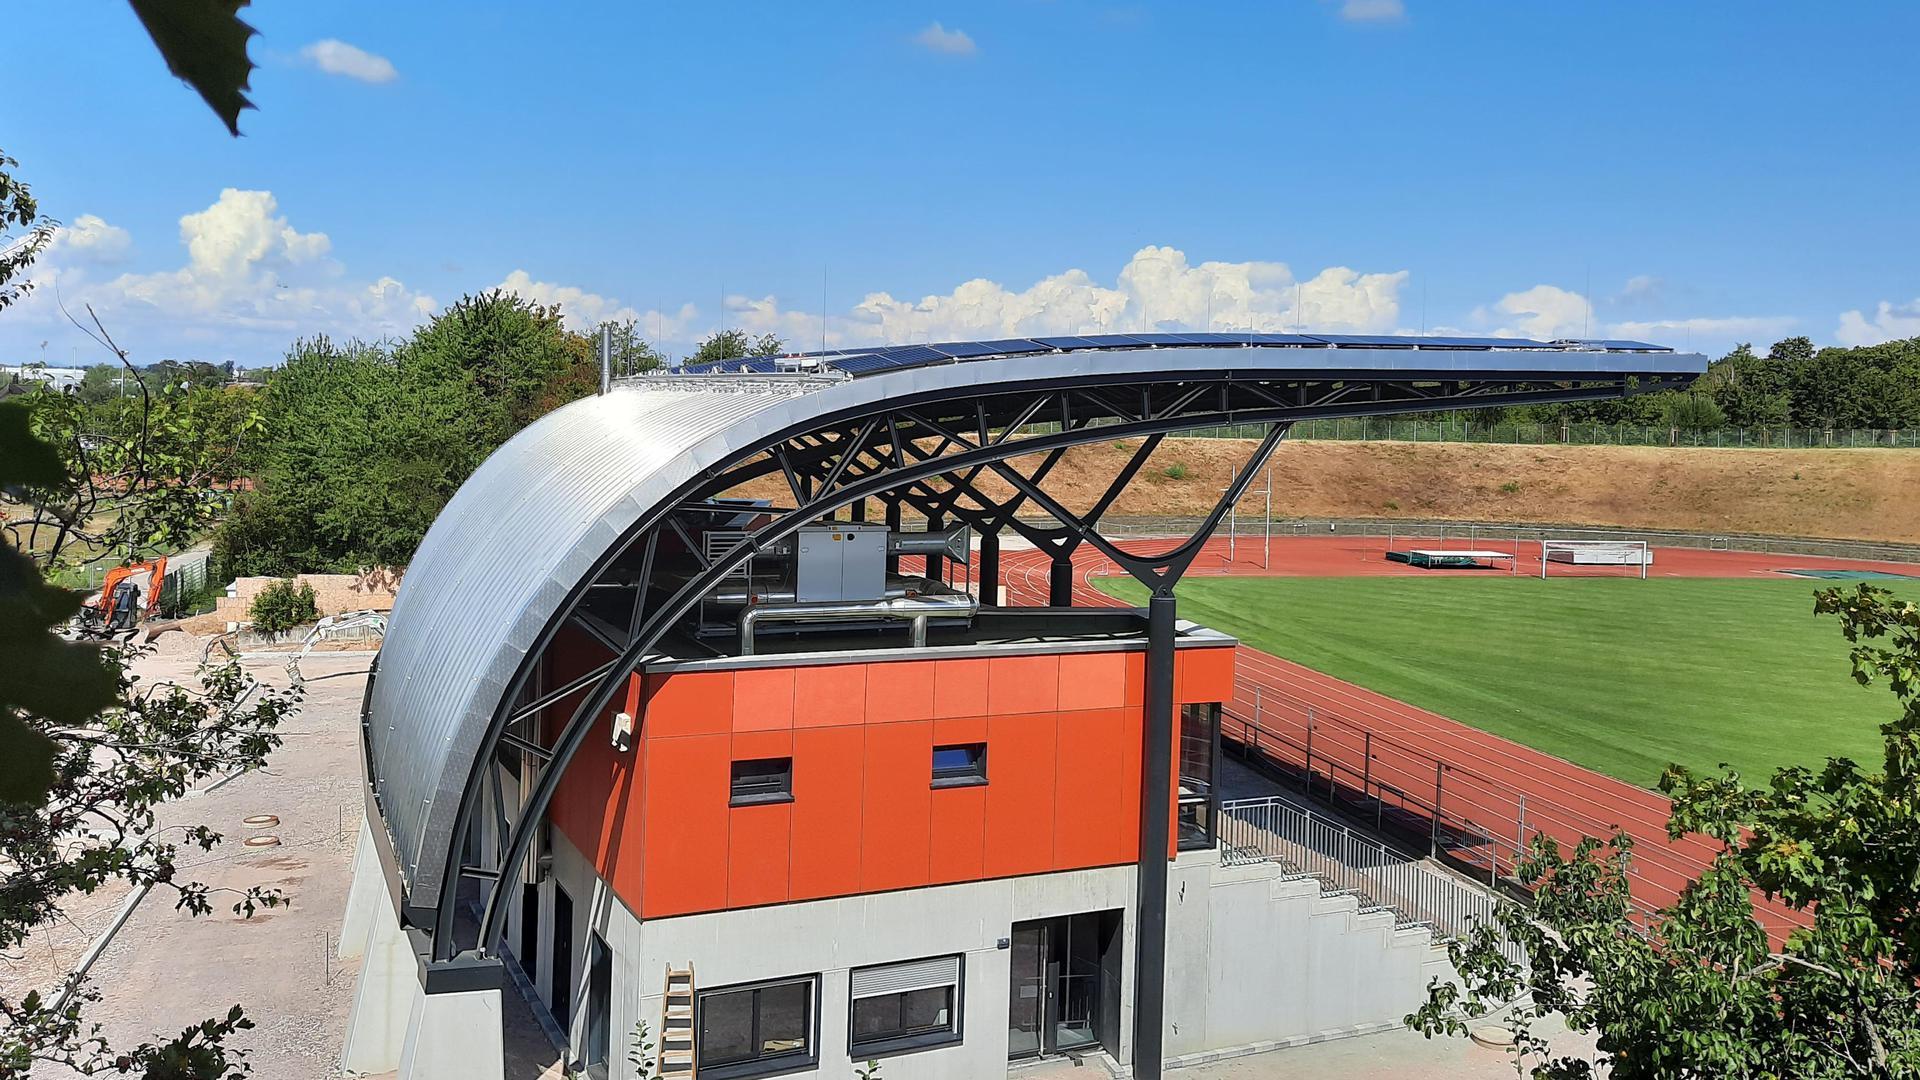 Stadiondach